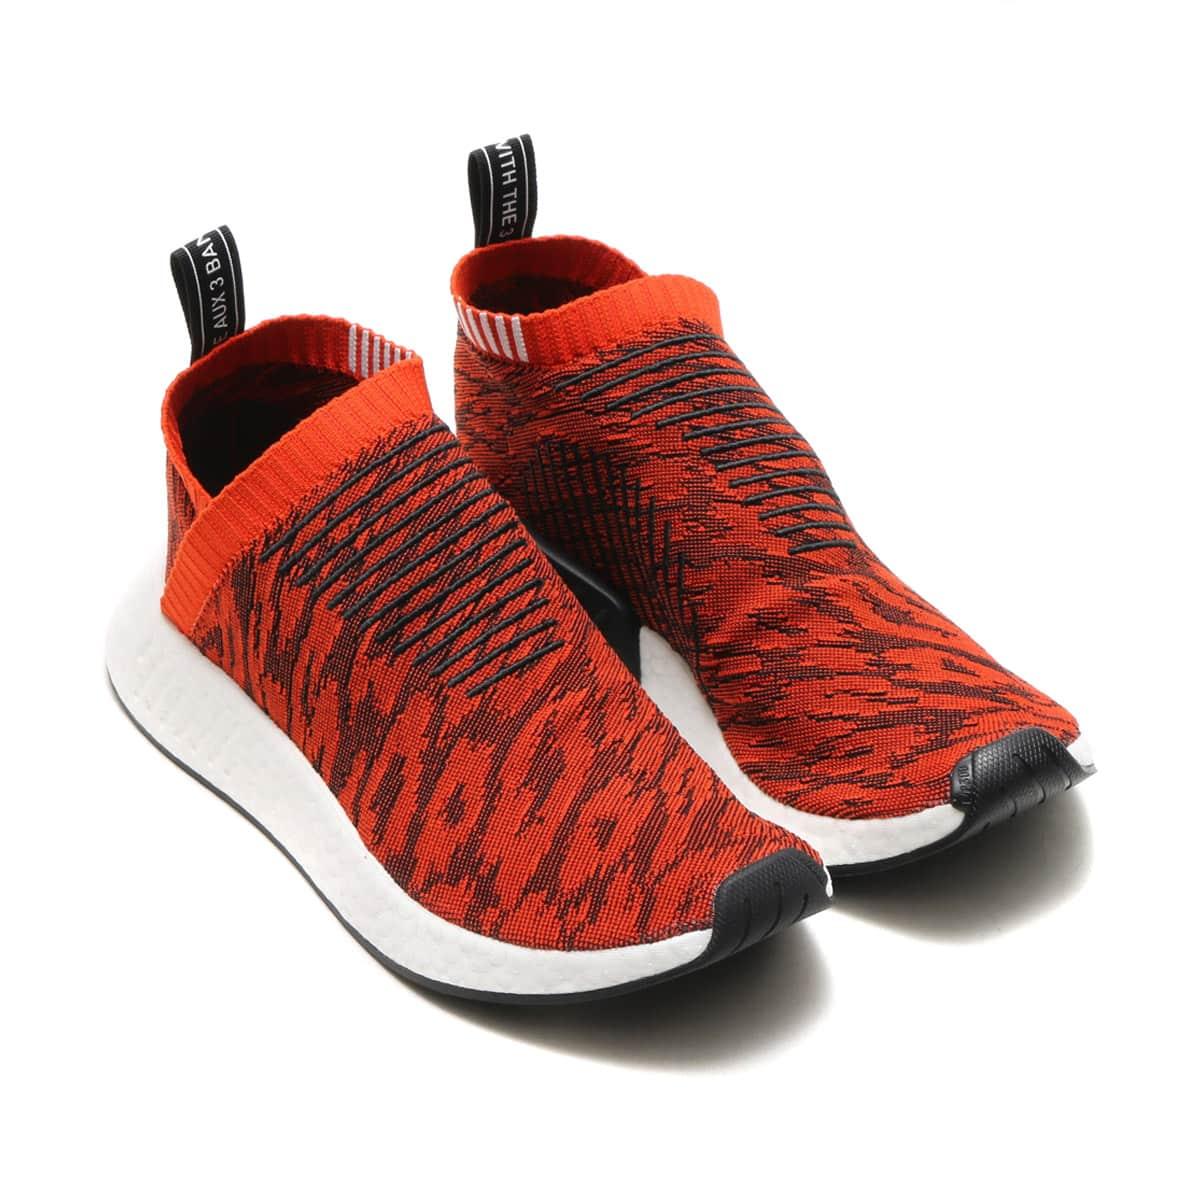 adidas Originals NMD_CS2 PK FUTURE